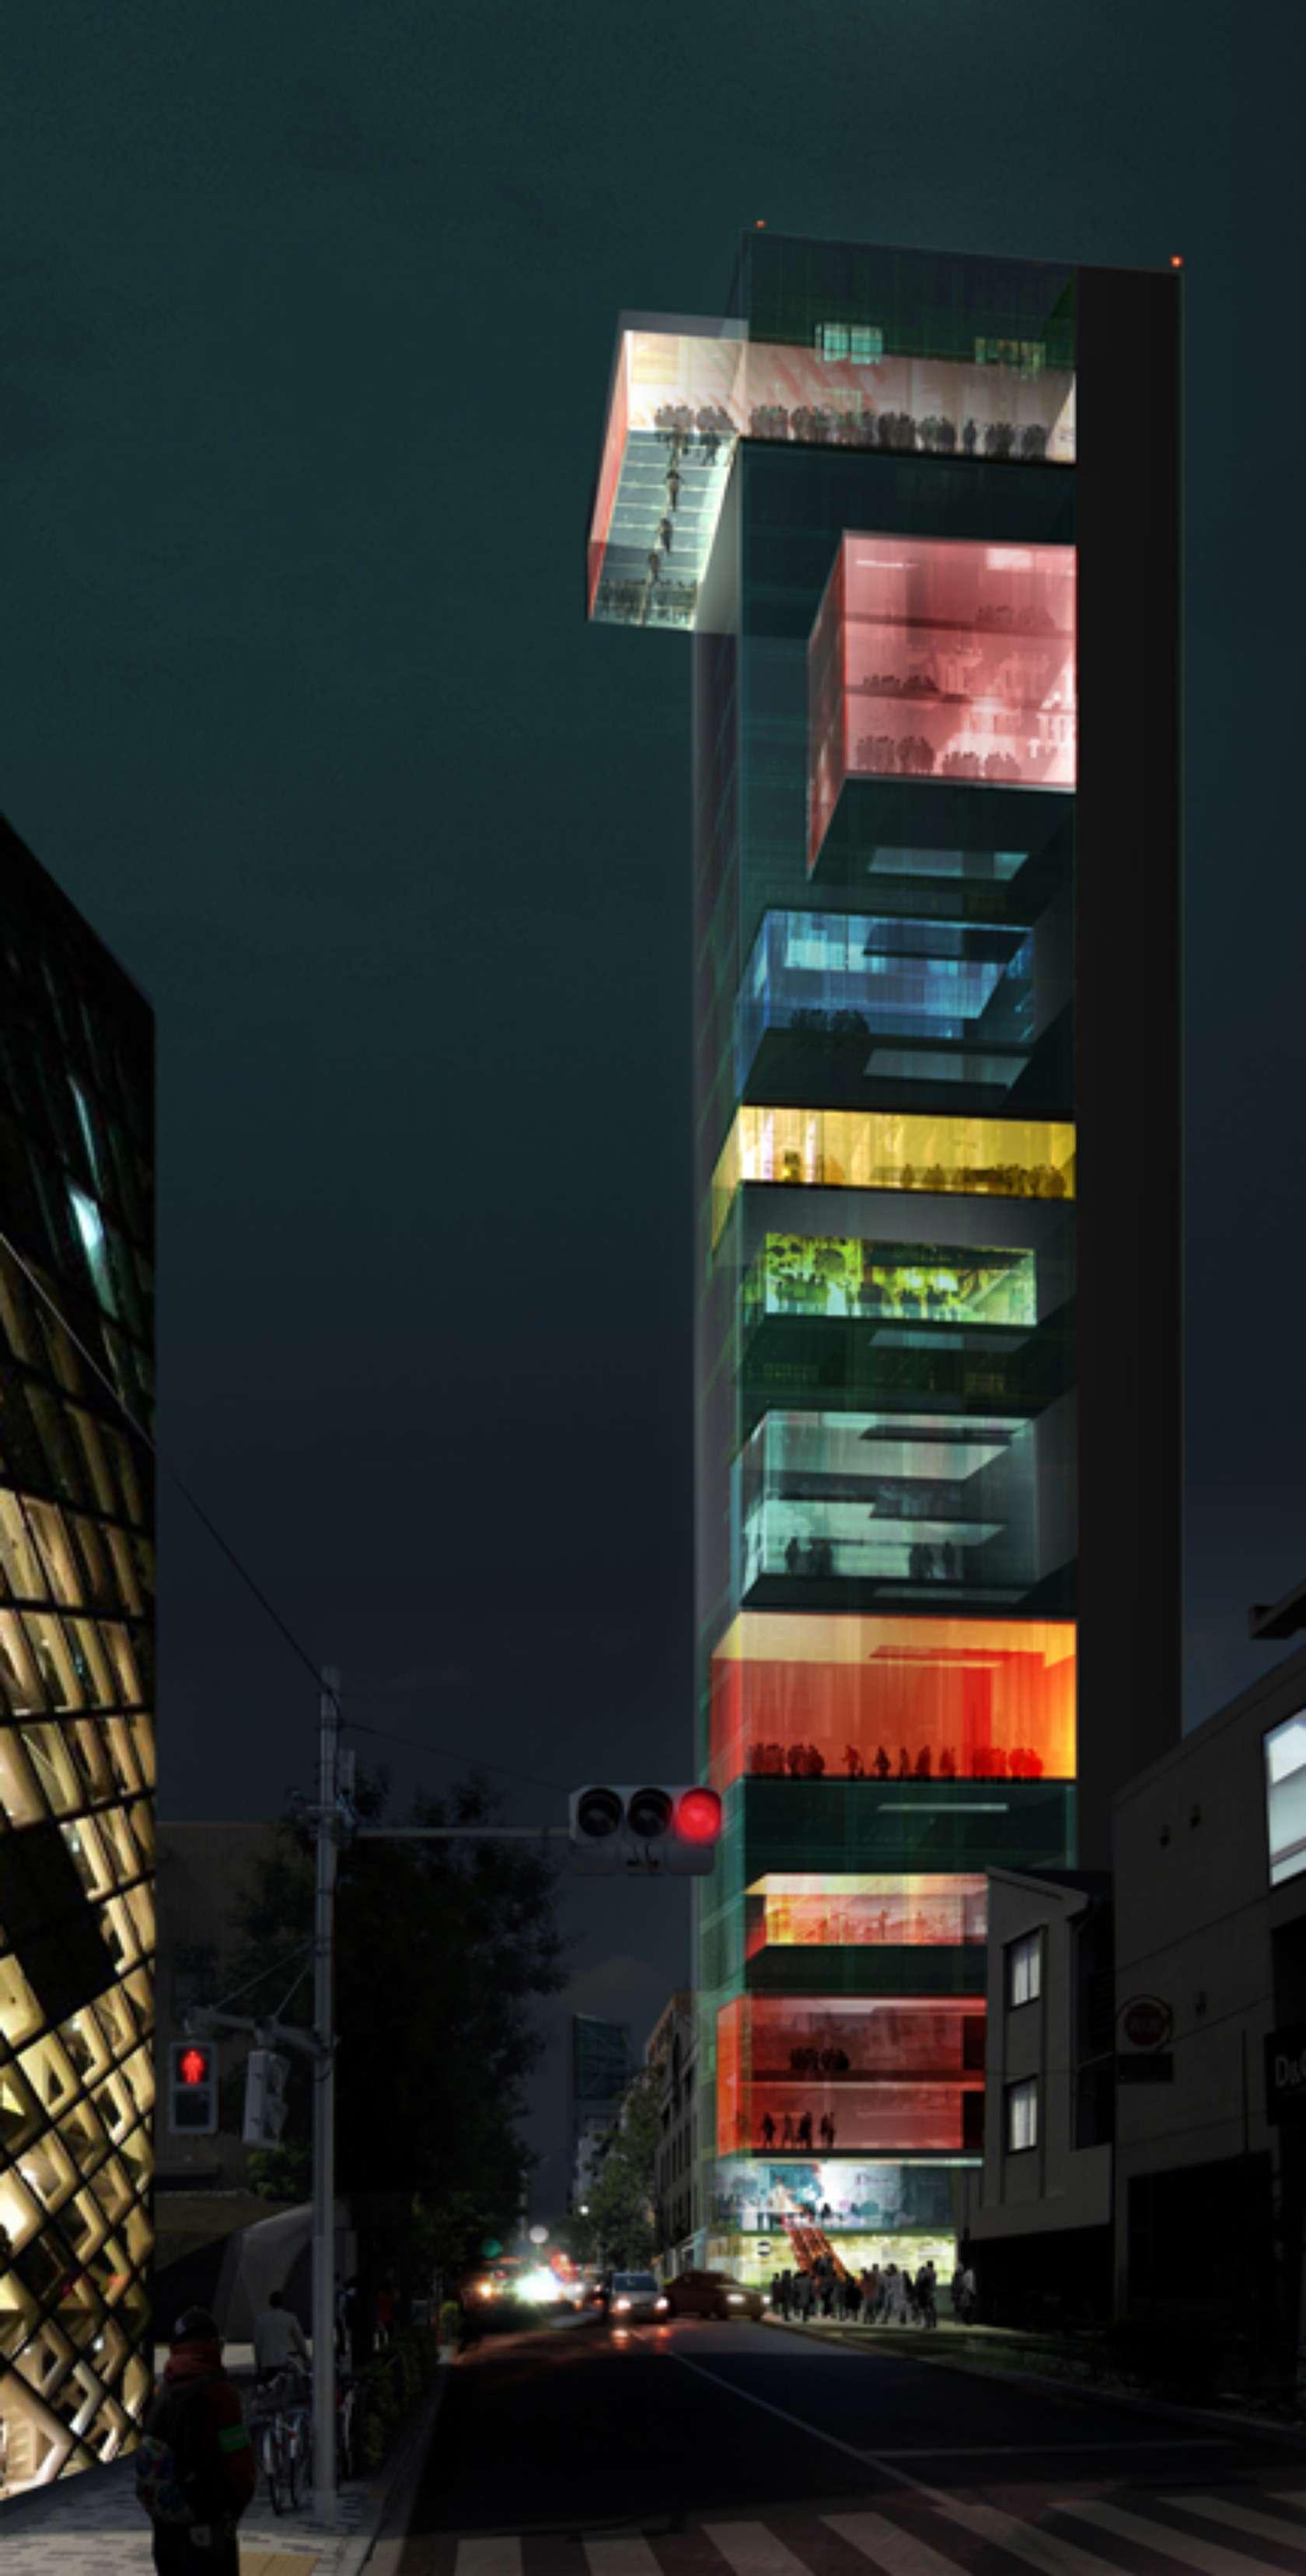 fashion museum in omotesando street vertical omotesando architizer. Black Bedroom Furniture Sets. Home Design Ideas